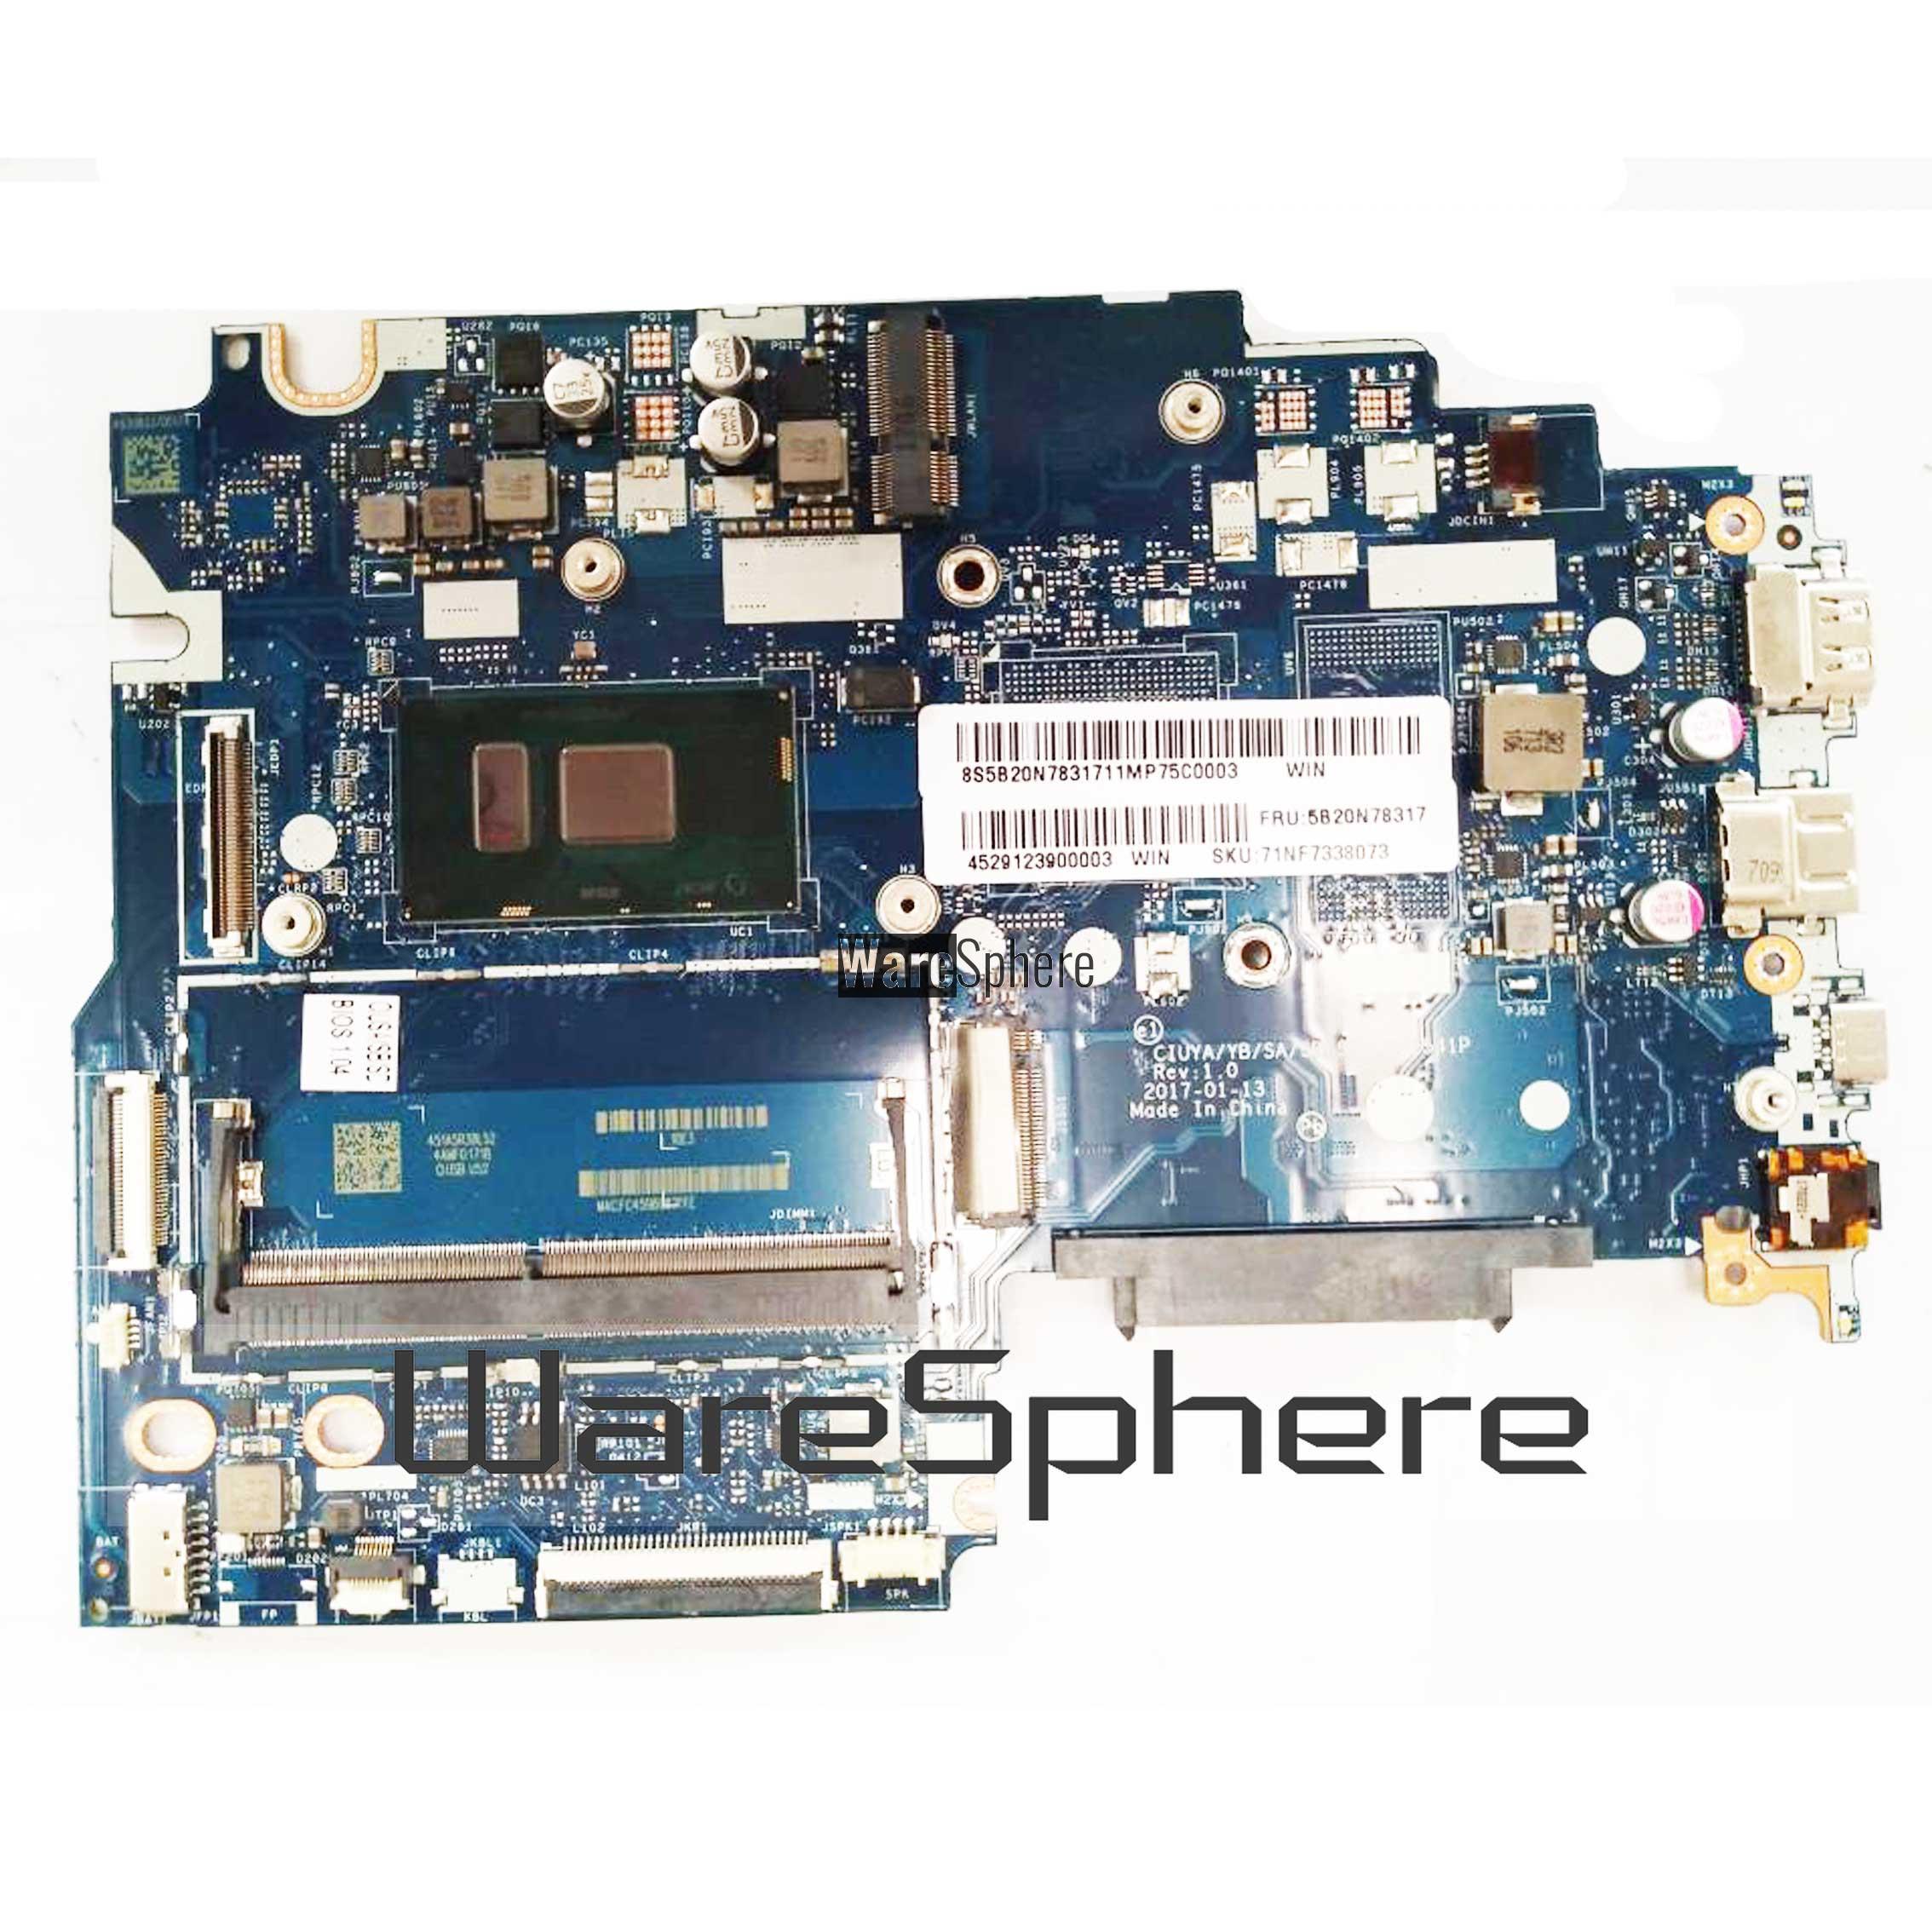 5b20n78317 La E541p Motherboard Intel I5 7200u For Lenovo Ideapad 320s 14ikb